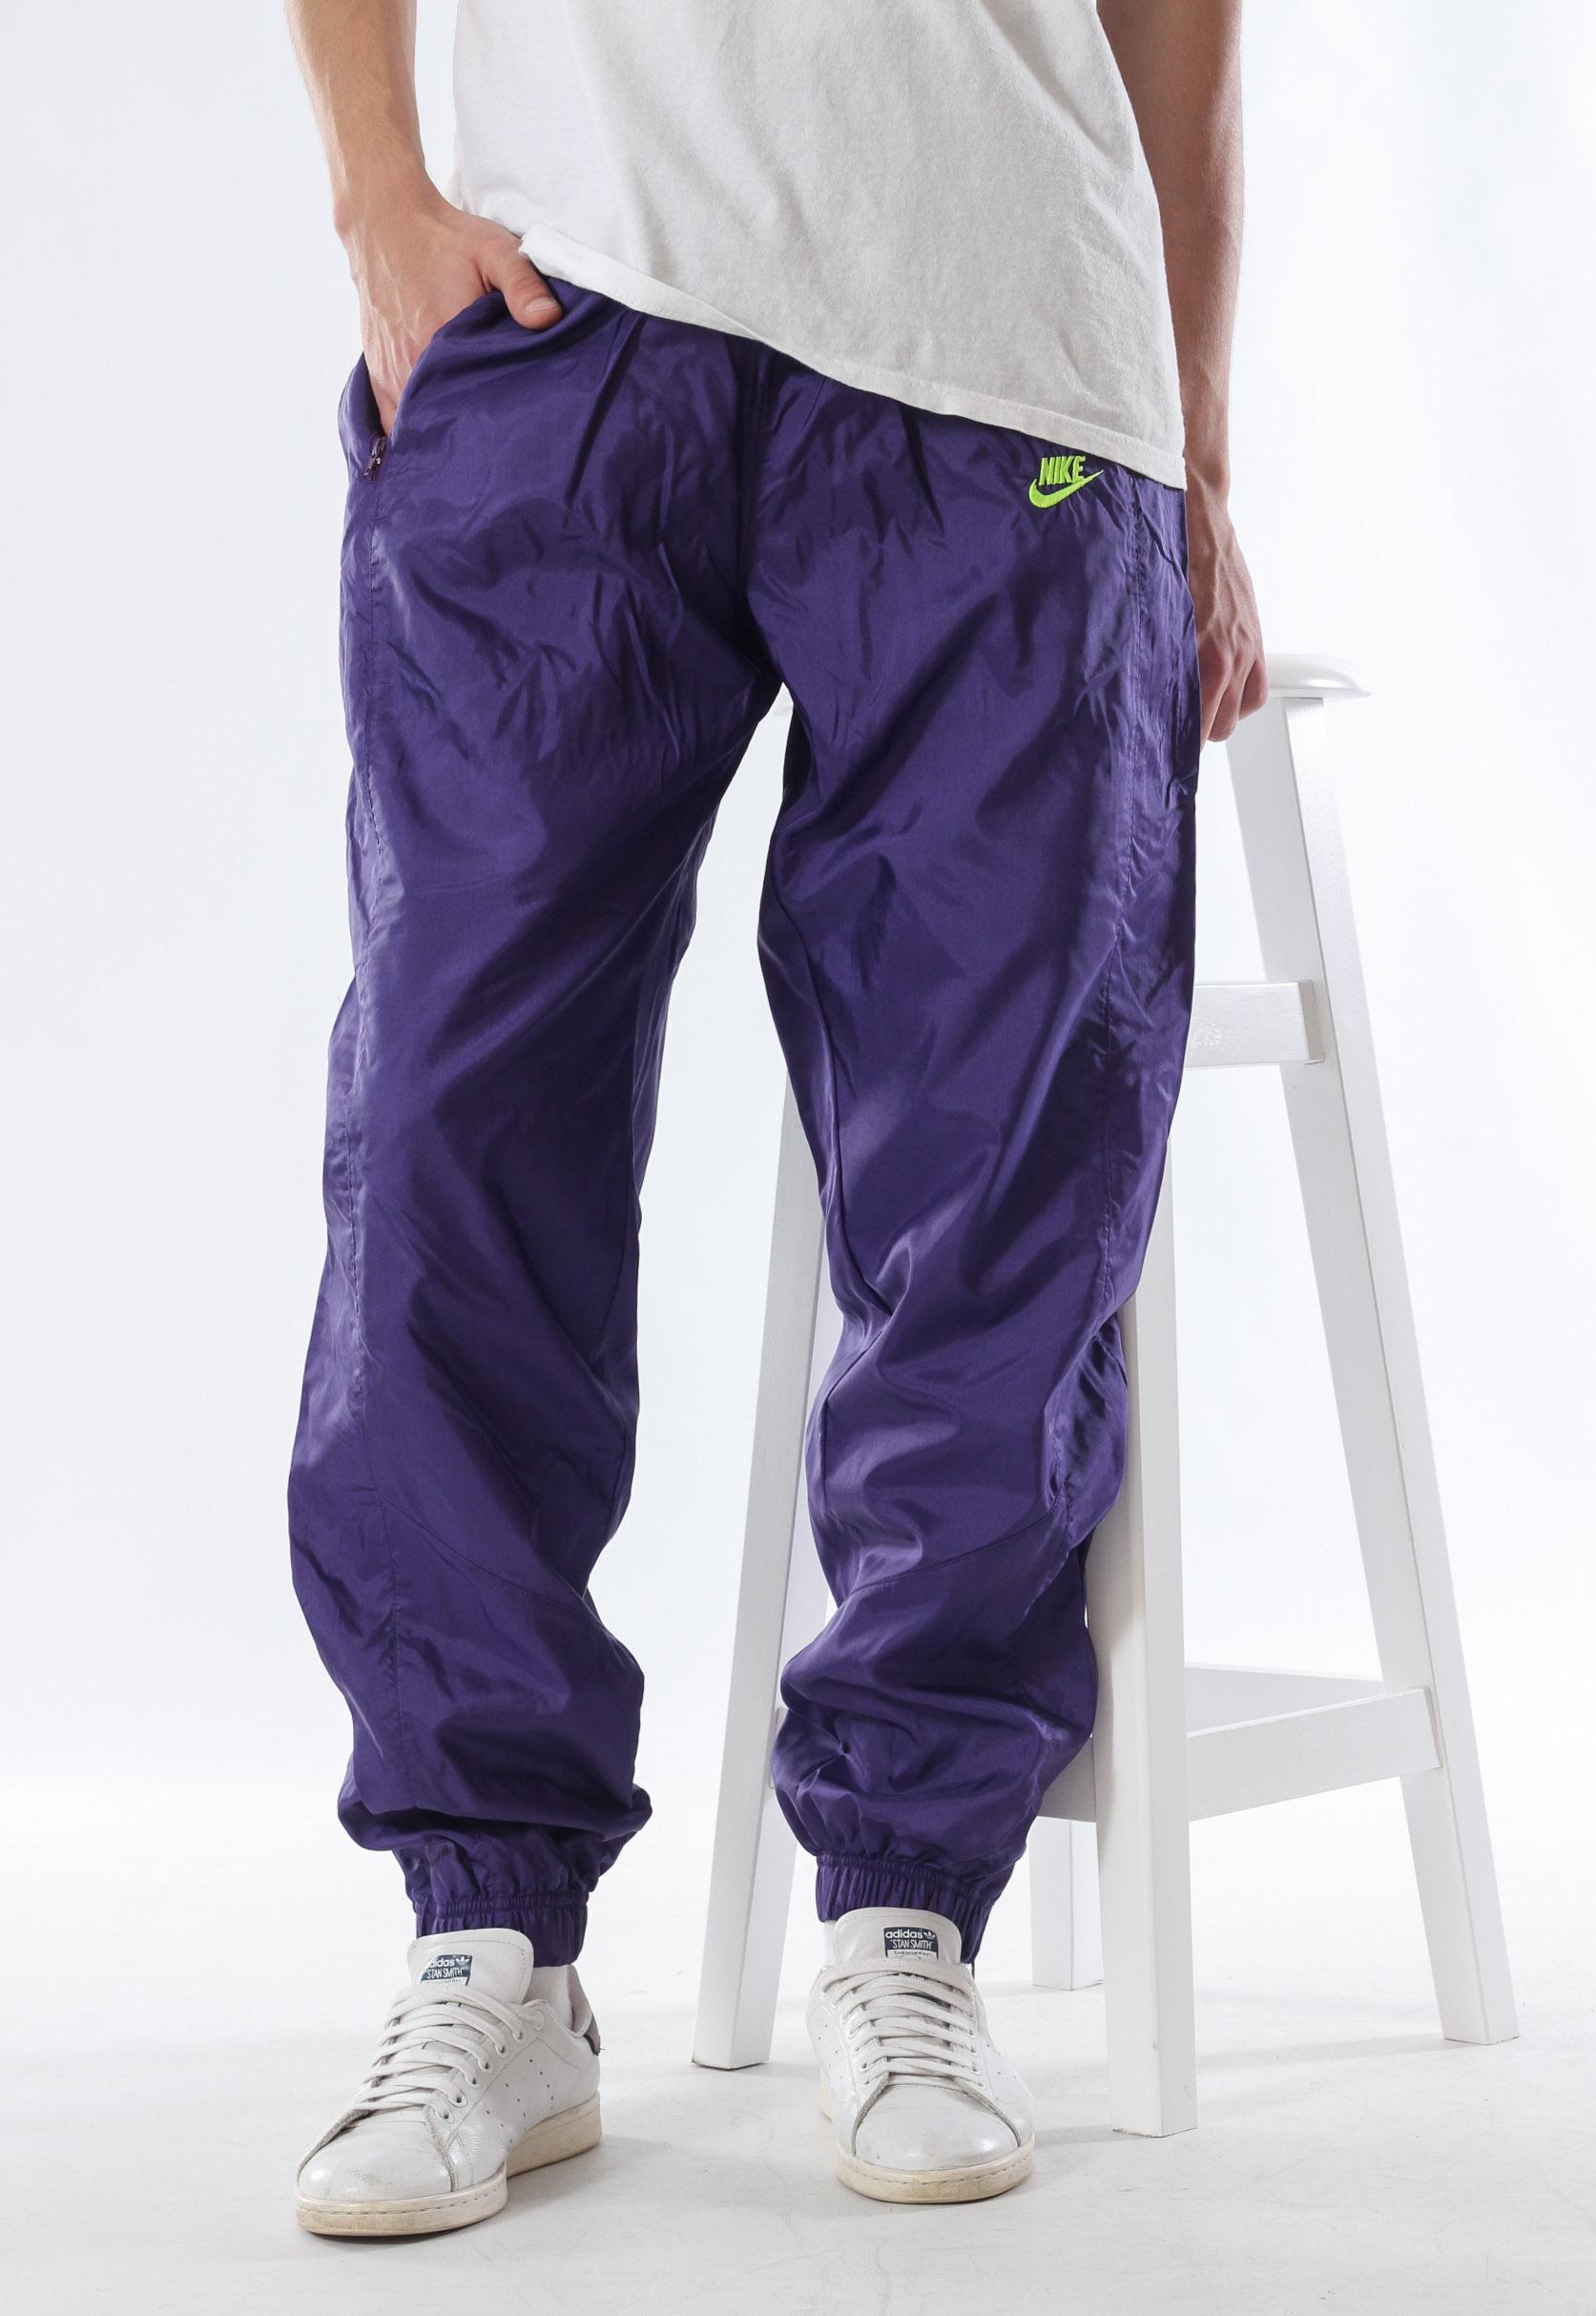 A3764 - 90s Vintage Mens NIKE Tracksuit Joggers Pants Trousers Purple Nylon  Size L